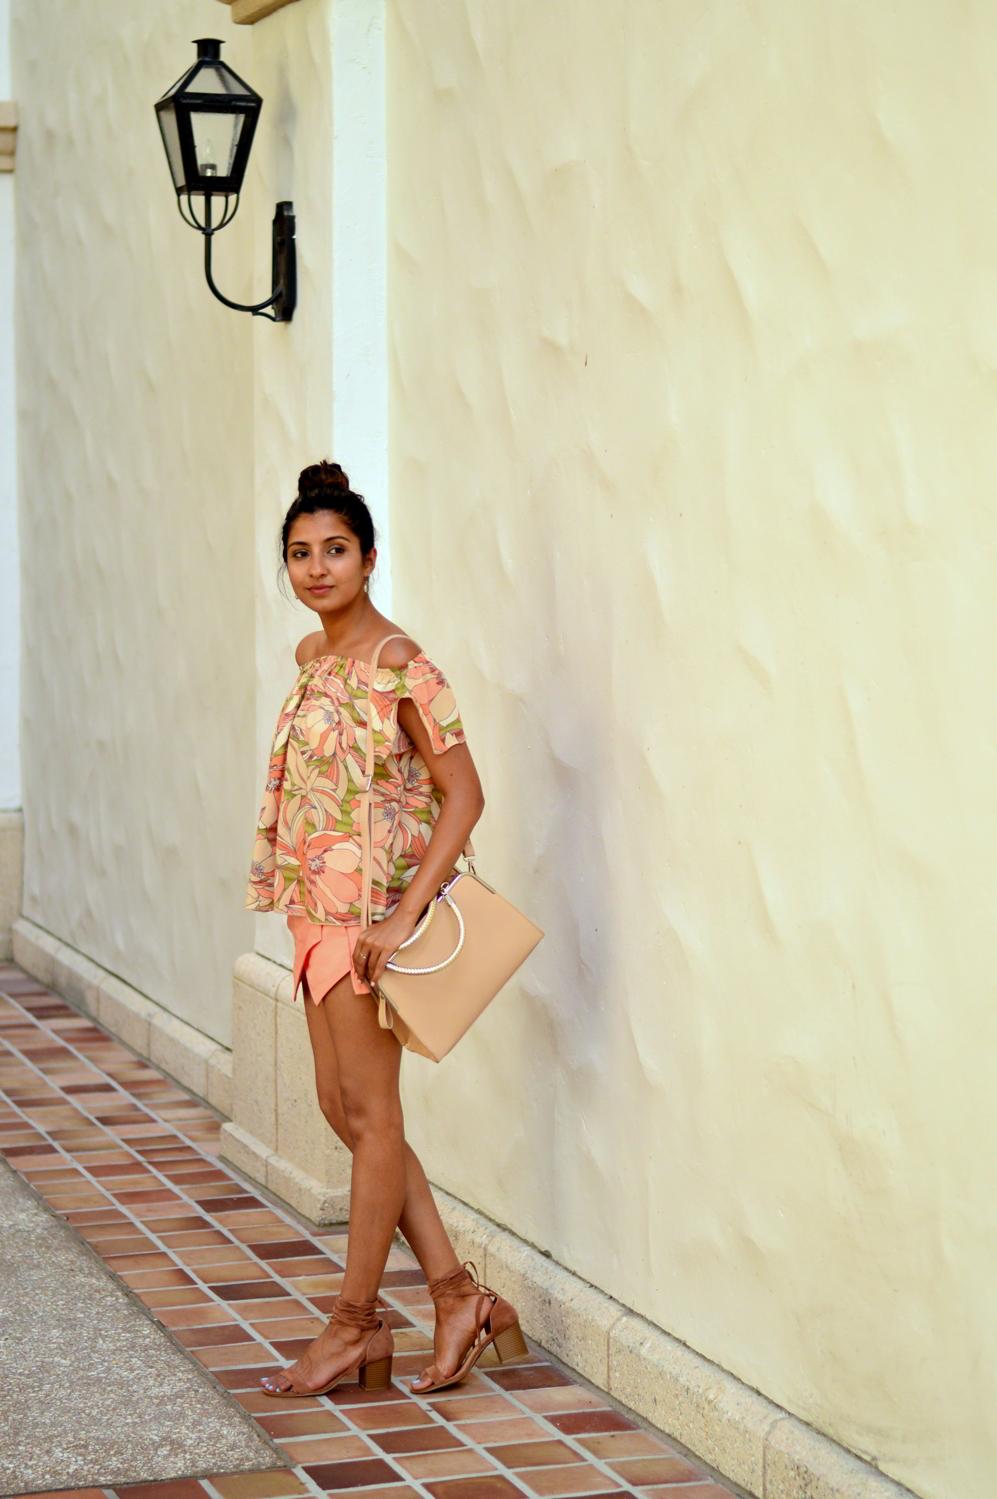 floral-off-the-shoulder-asymmetric-skort-lace-up-sandals-blogger-outfit-summer 7